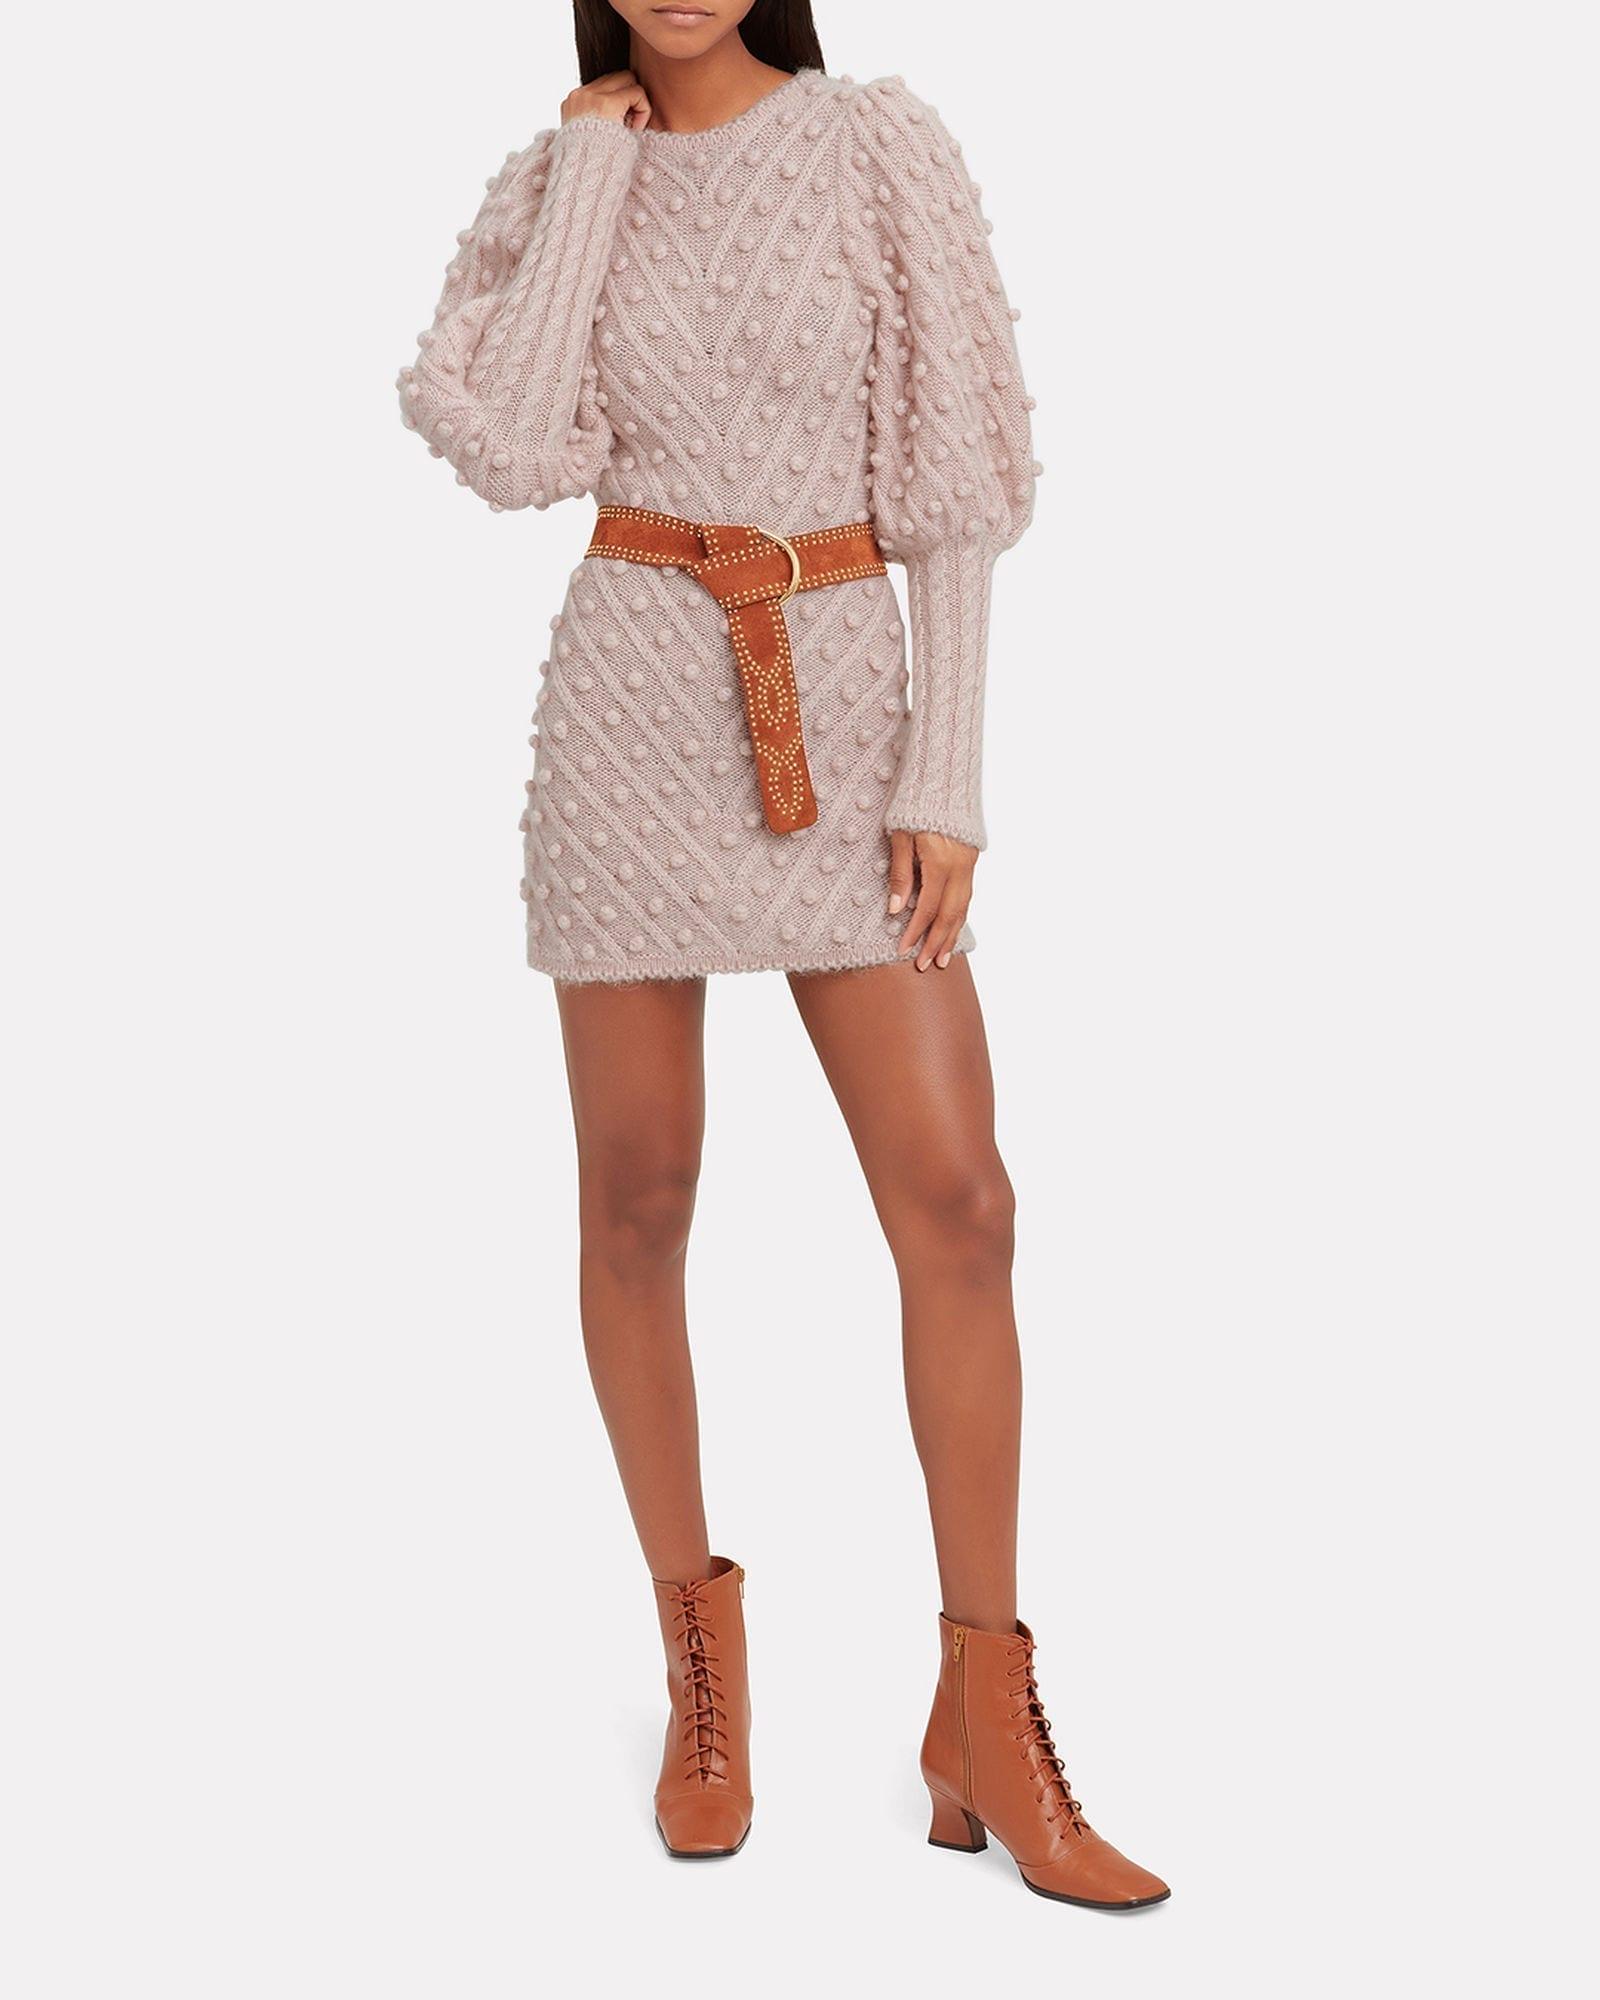 760a62c82e7 ZIMMERMANN Fleeting Bauble Sweater Pink Dress - We Select Dresses